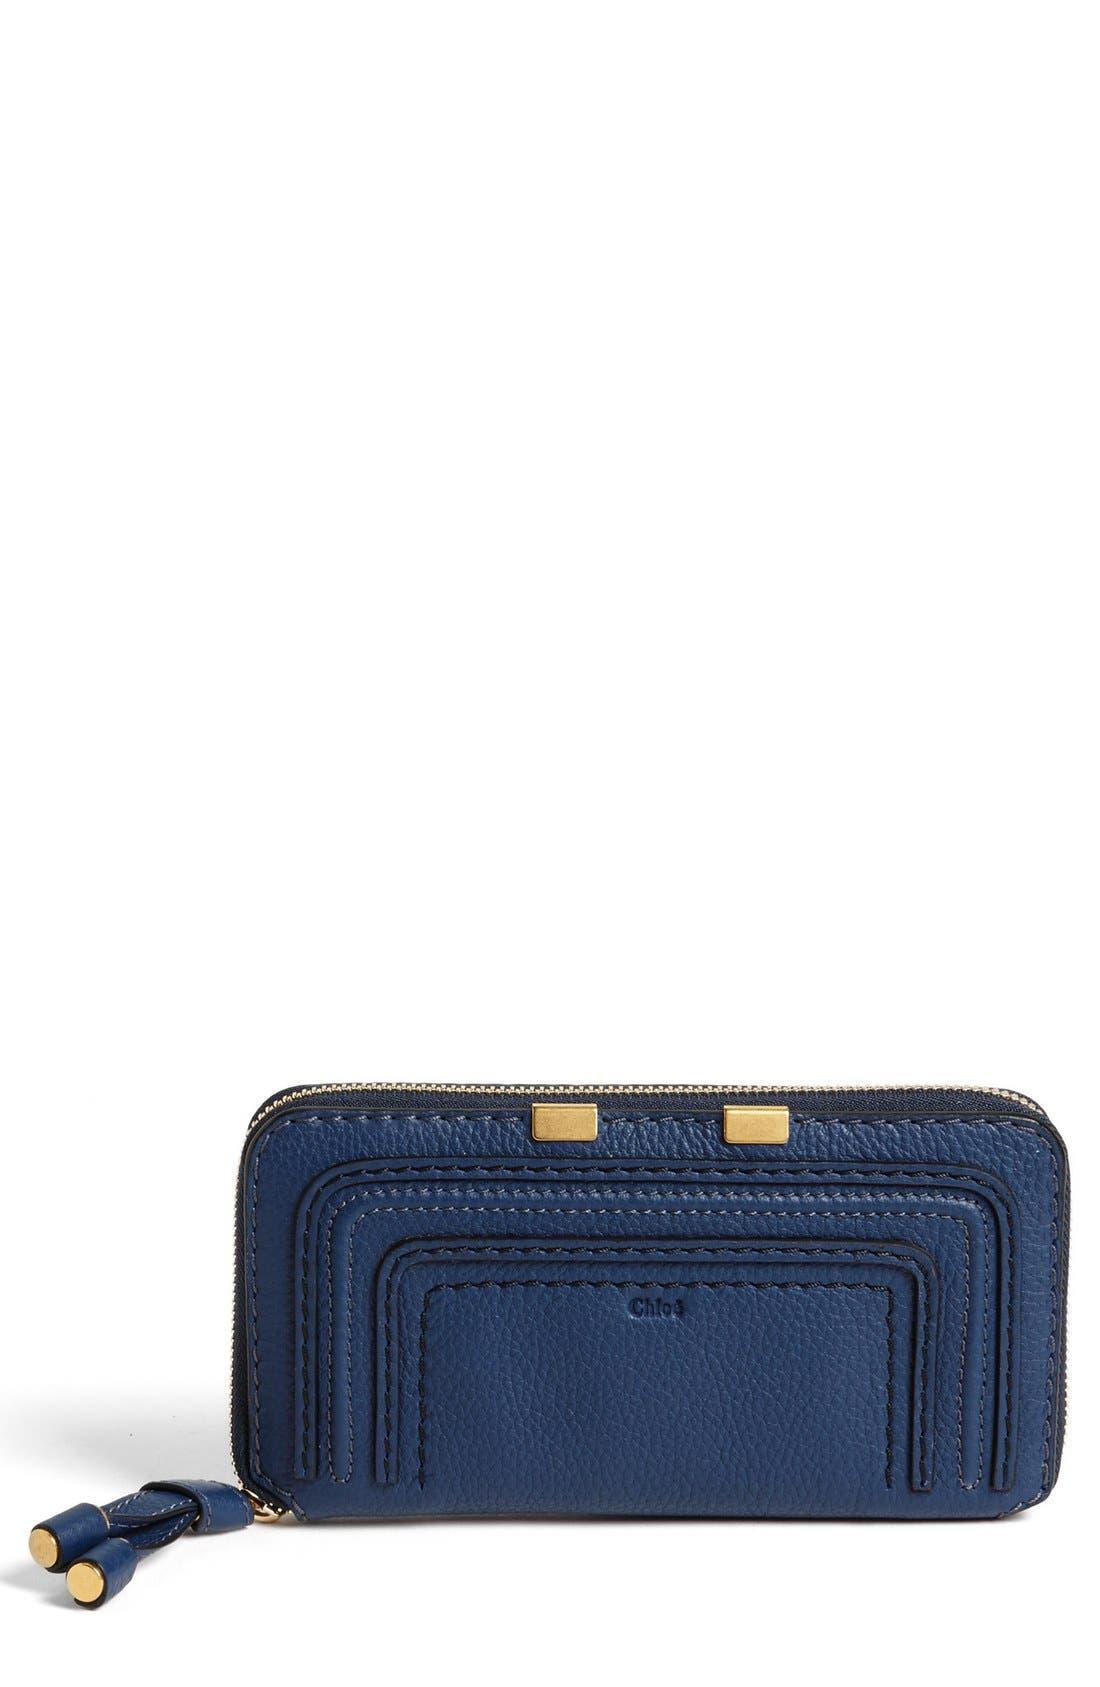 'Marcie - Long' Zip Around Wallet,                         Main,                         color, Royal Navy